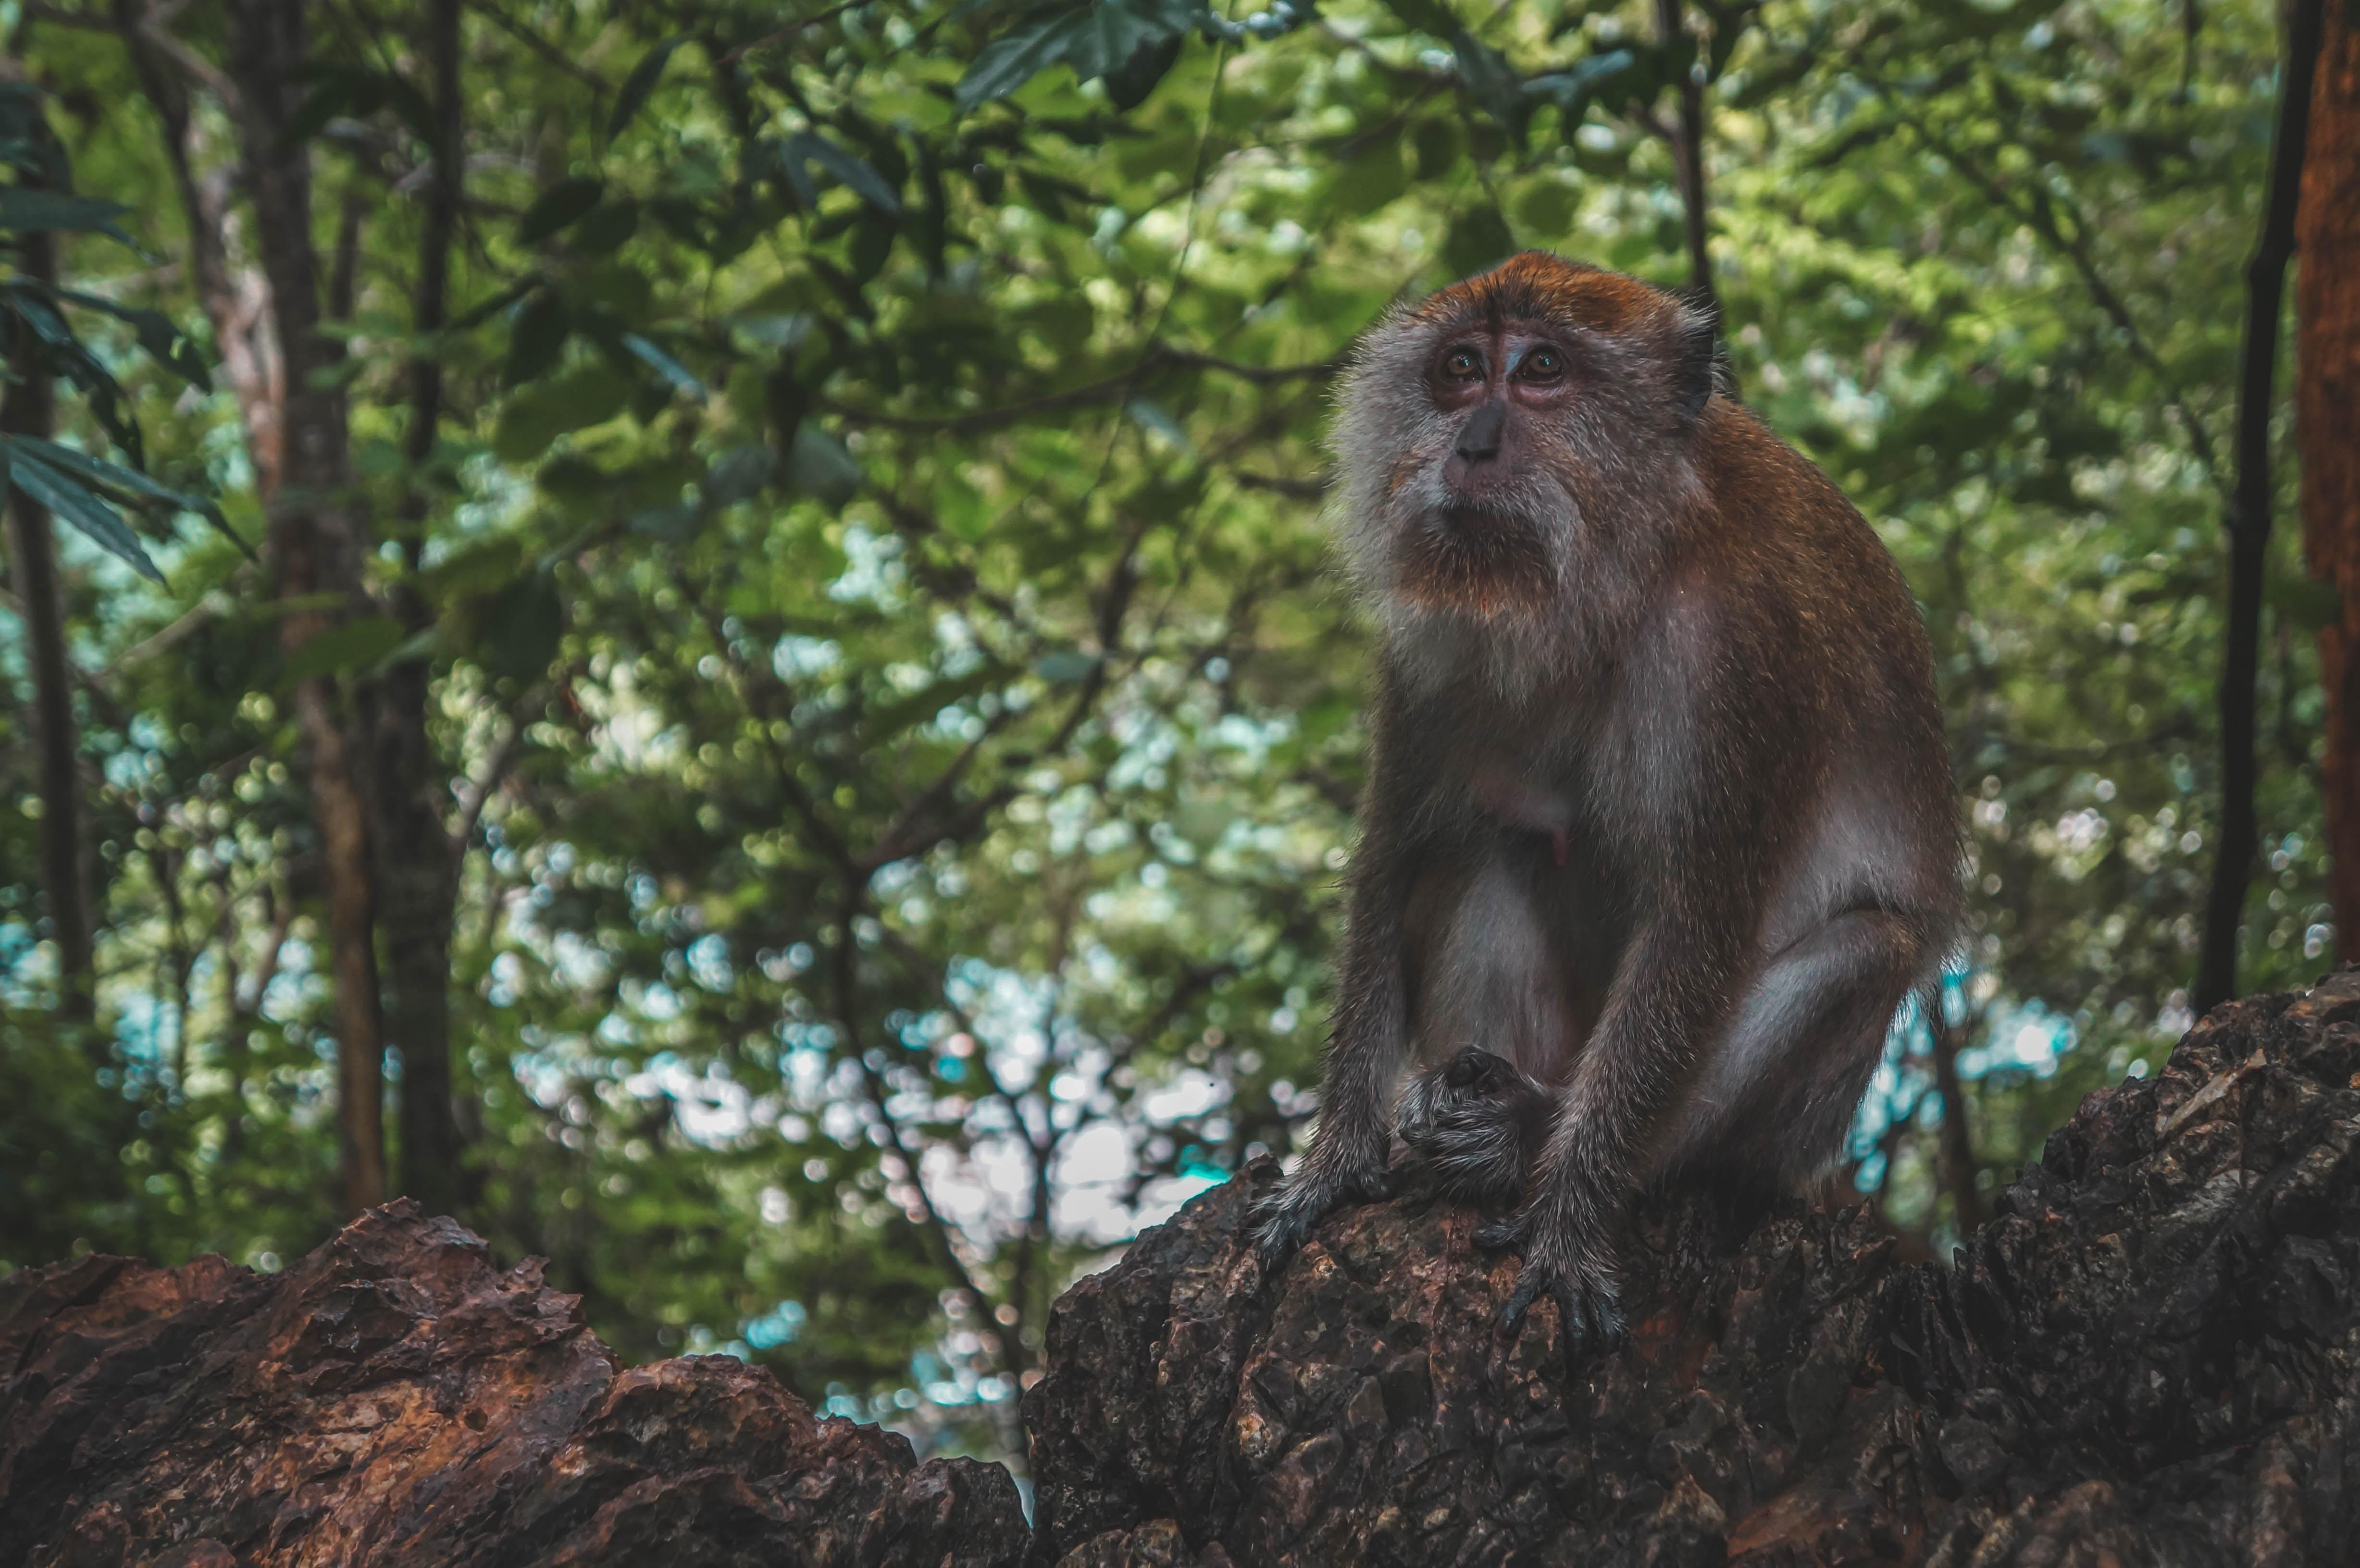 brown monkey sitting beside trees